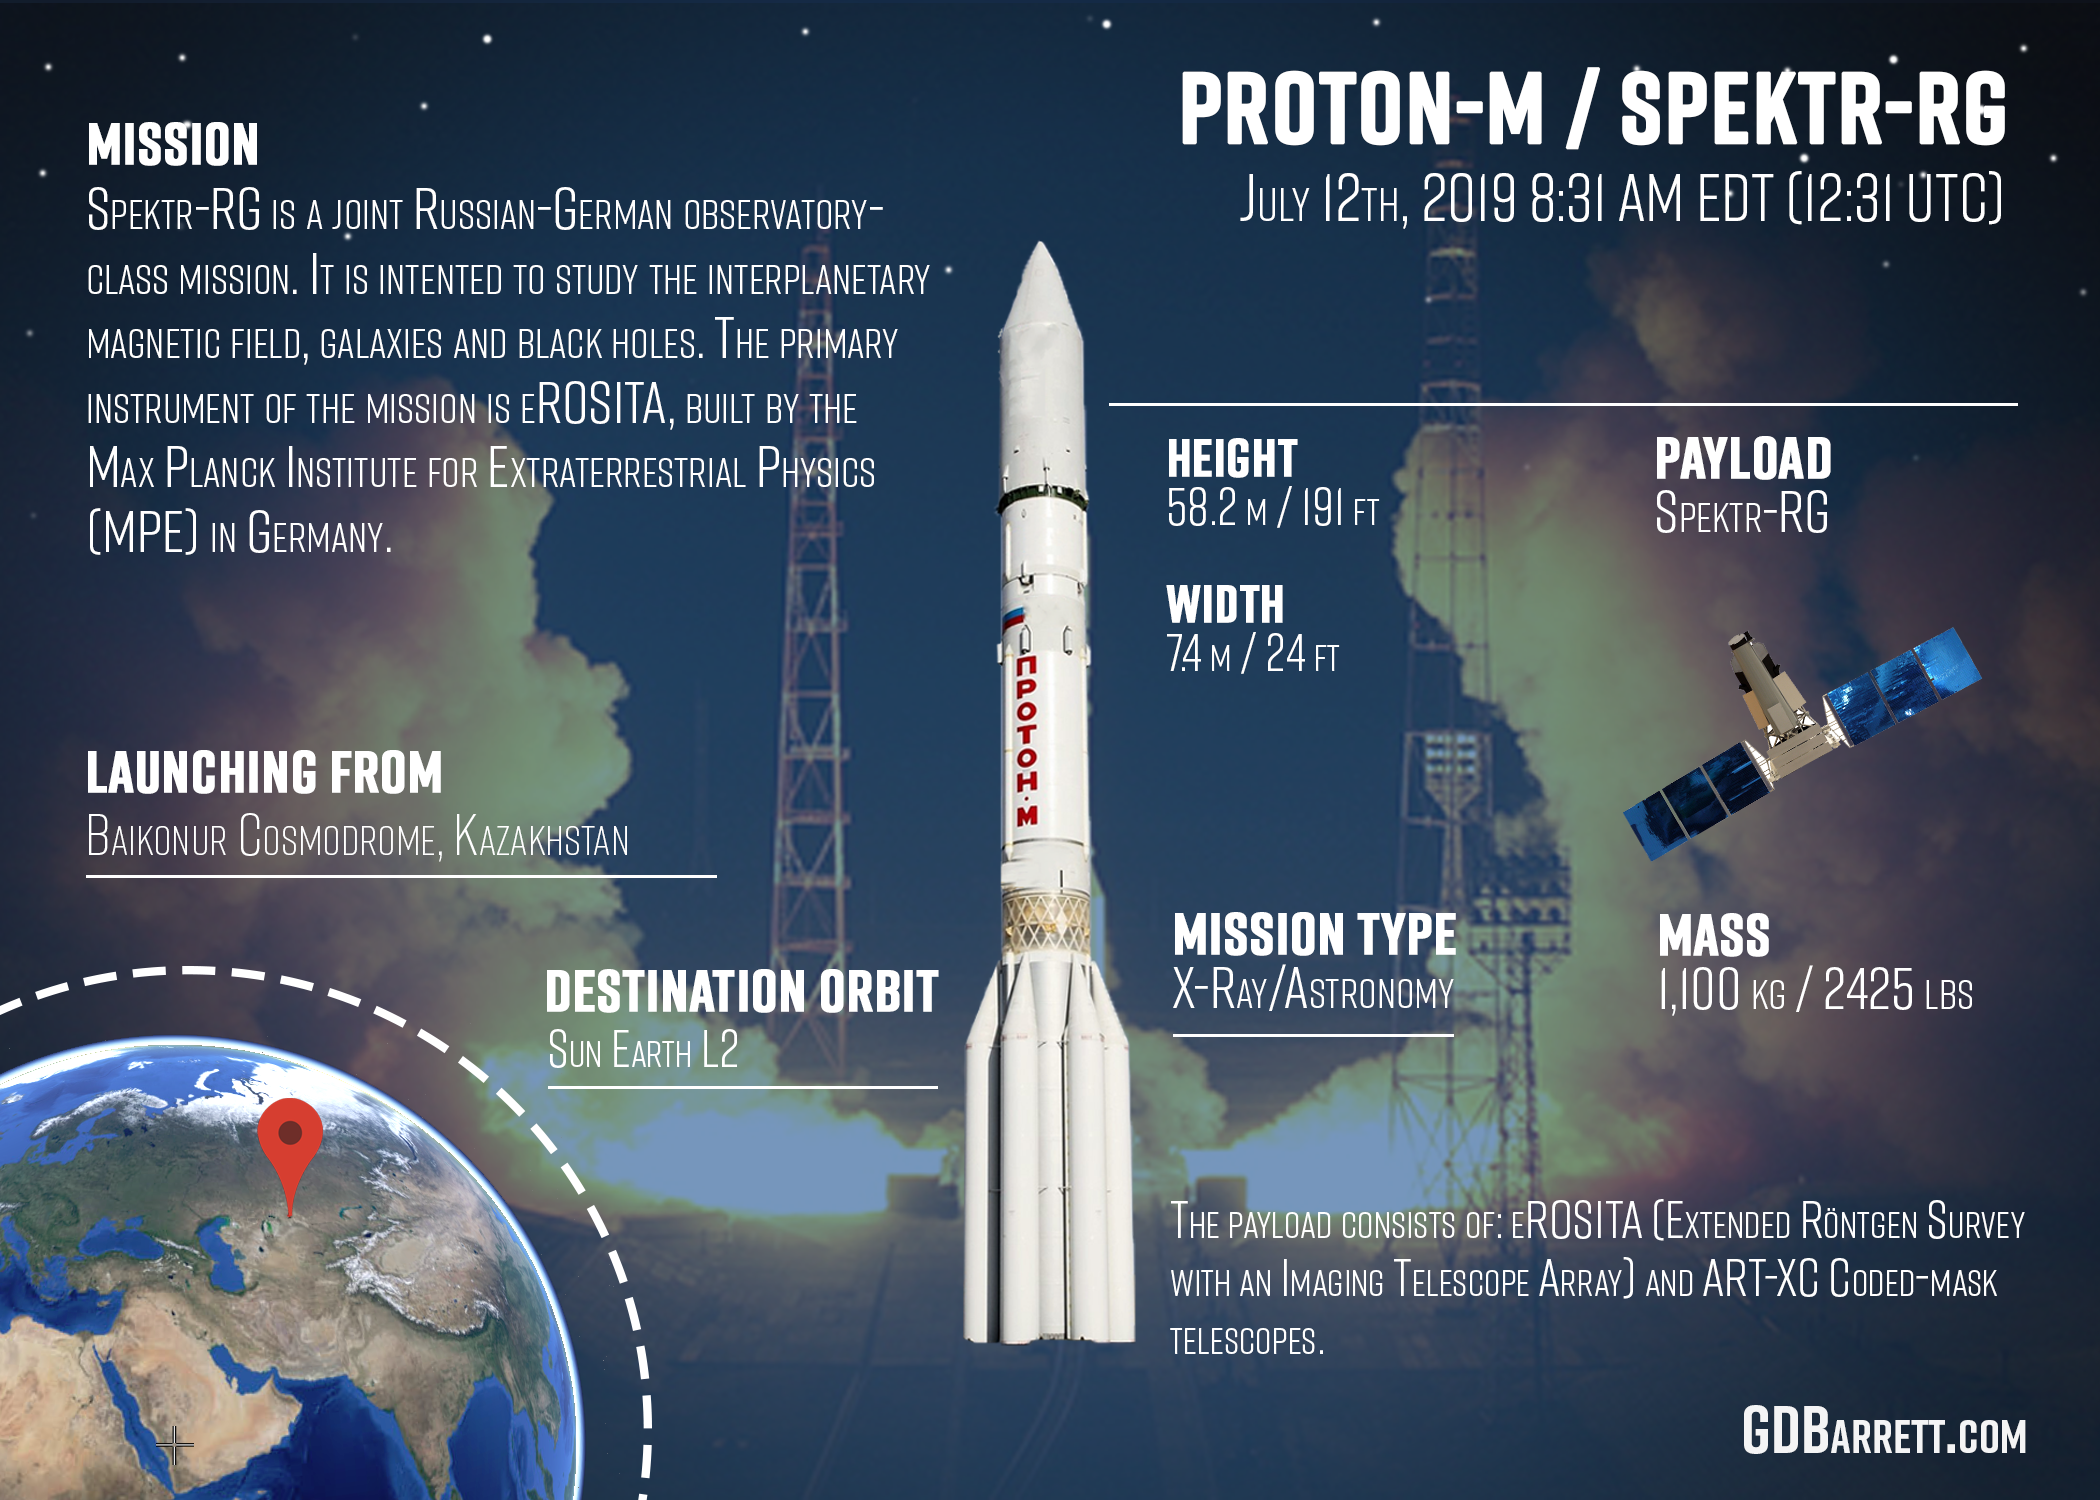 Roscosmos Proton M Spektr-RG